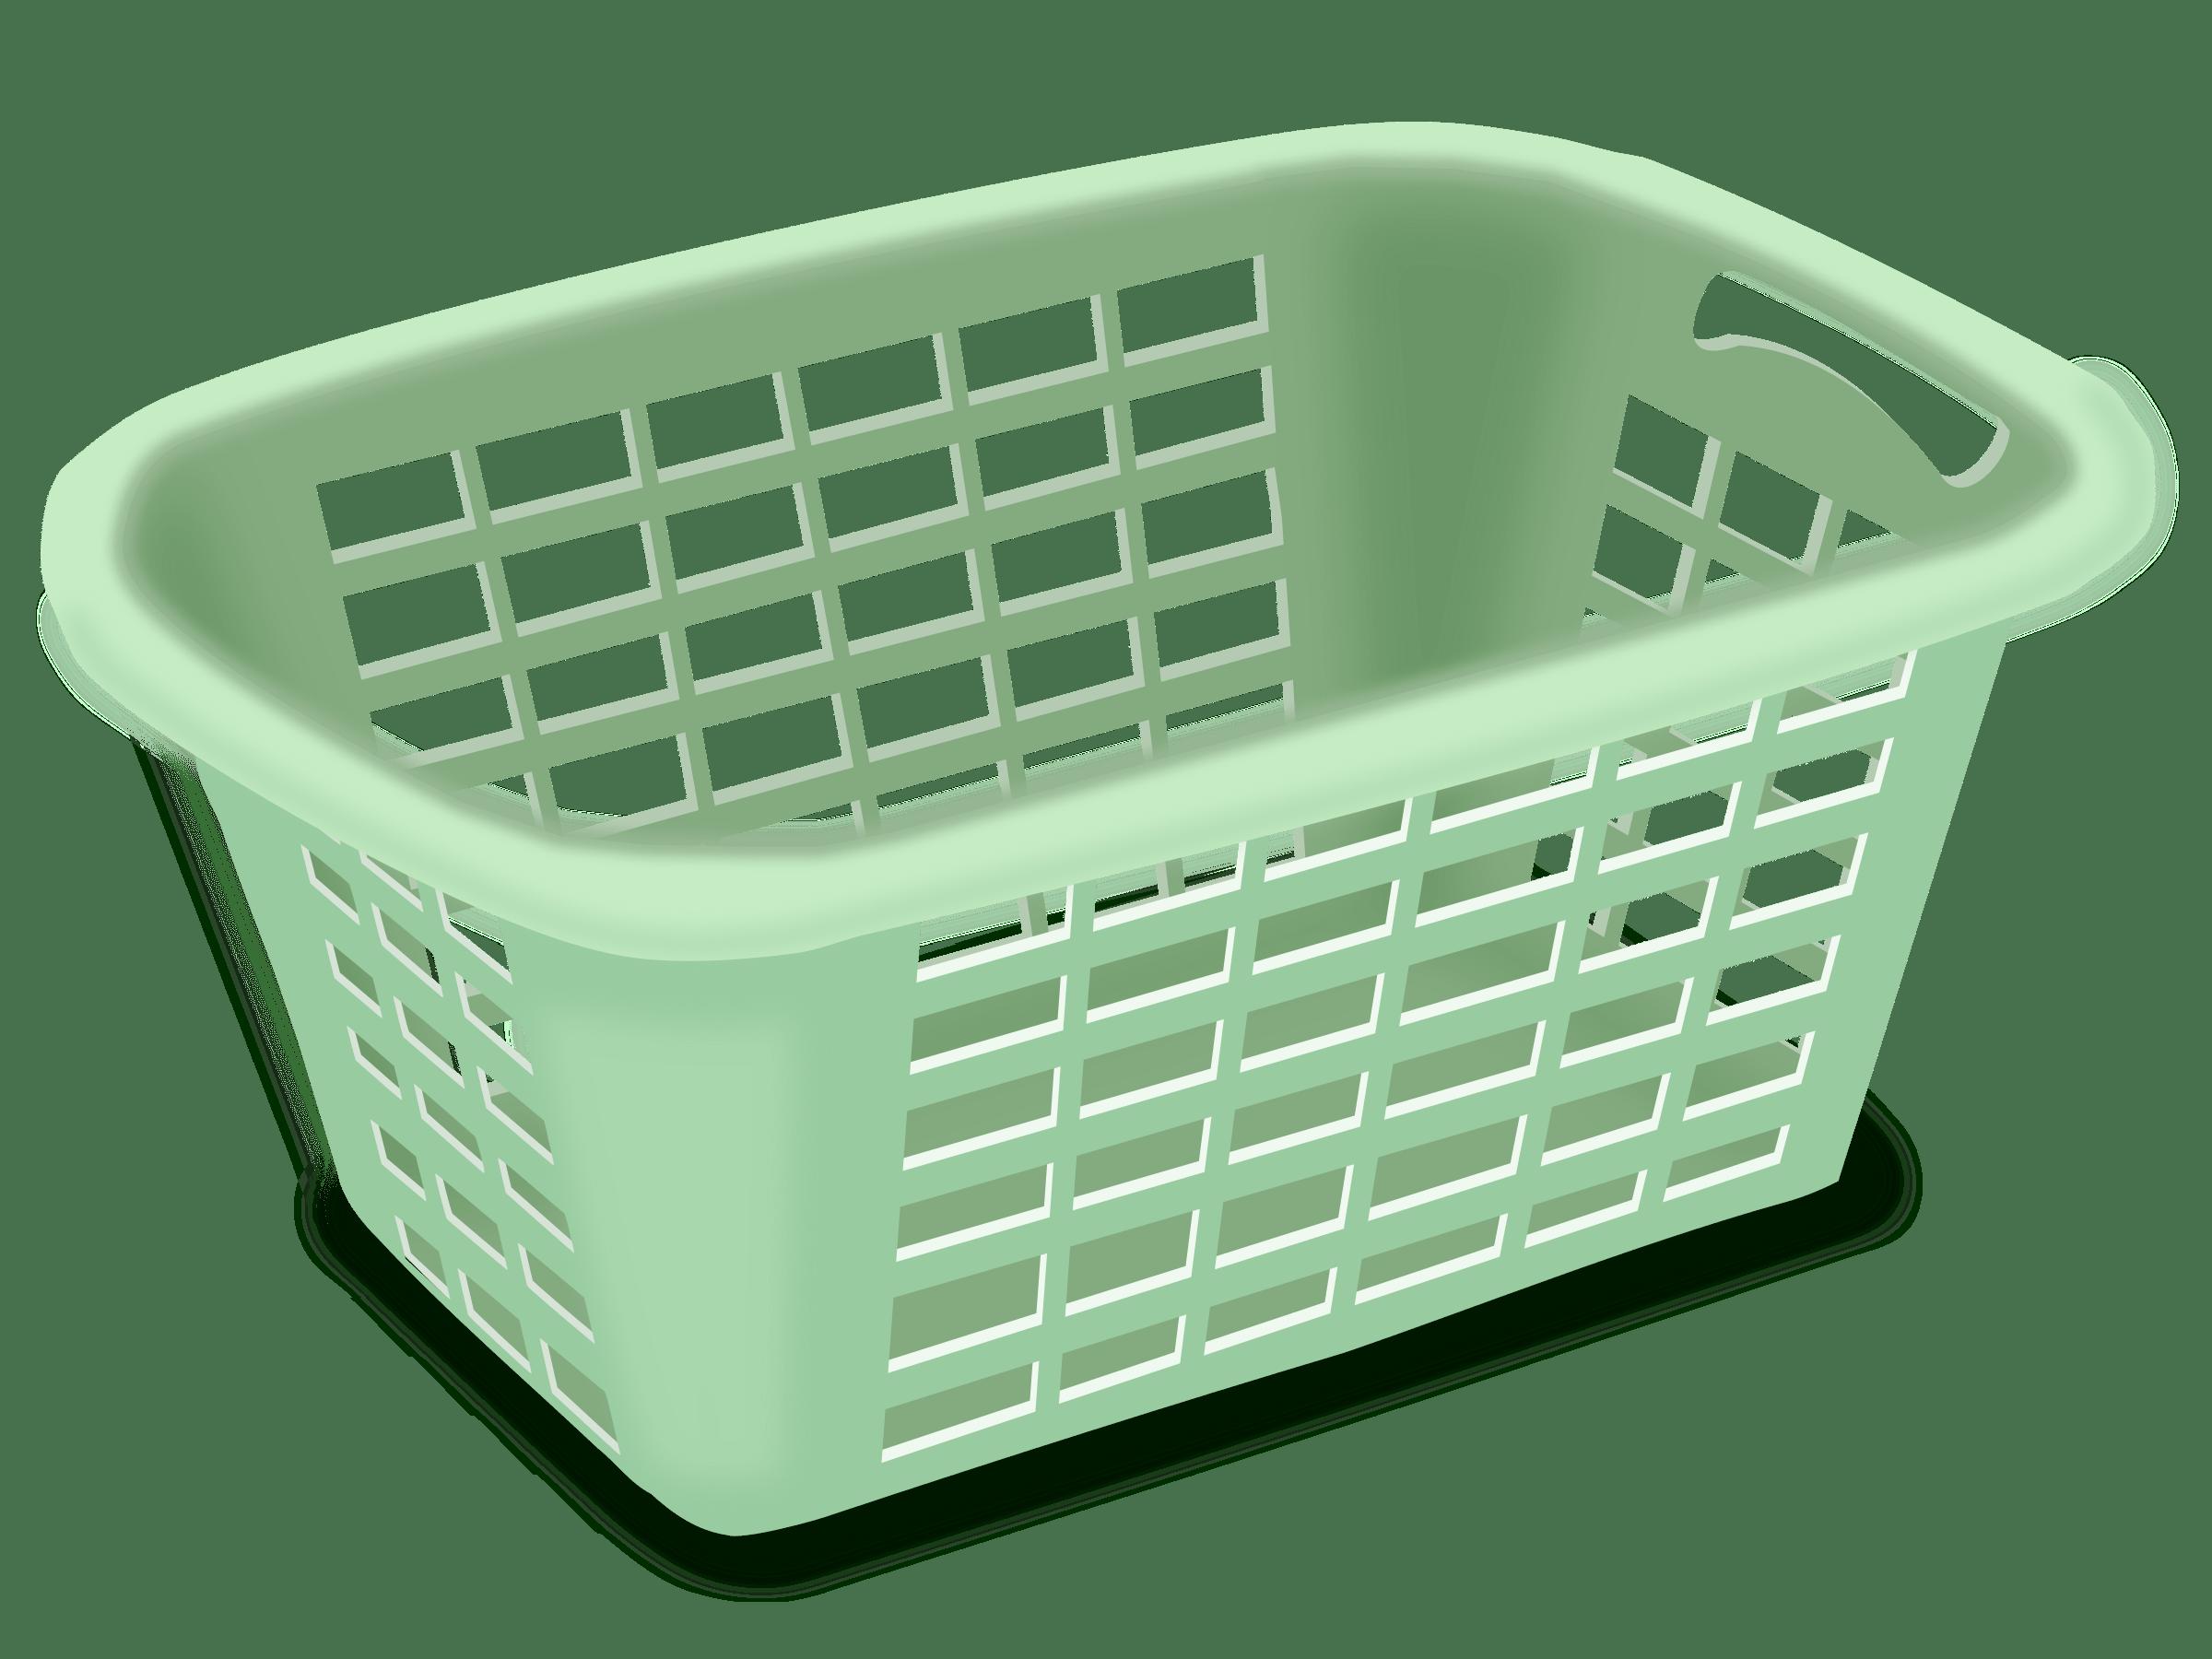 svg transparent download Put in hamper clipart. Plastic laundry basket clip.